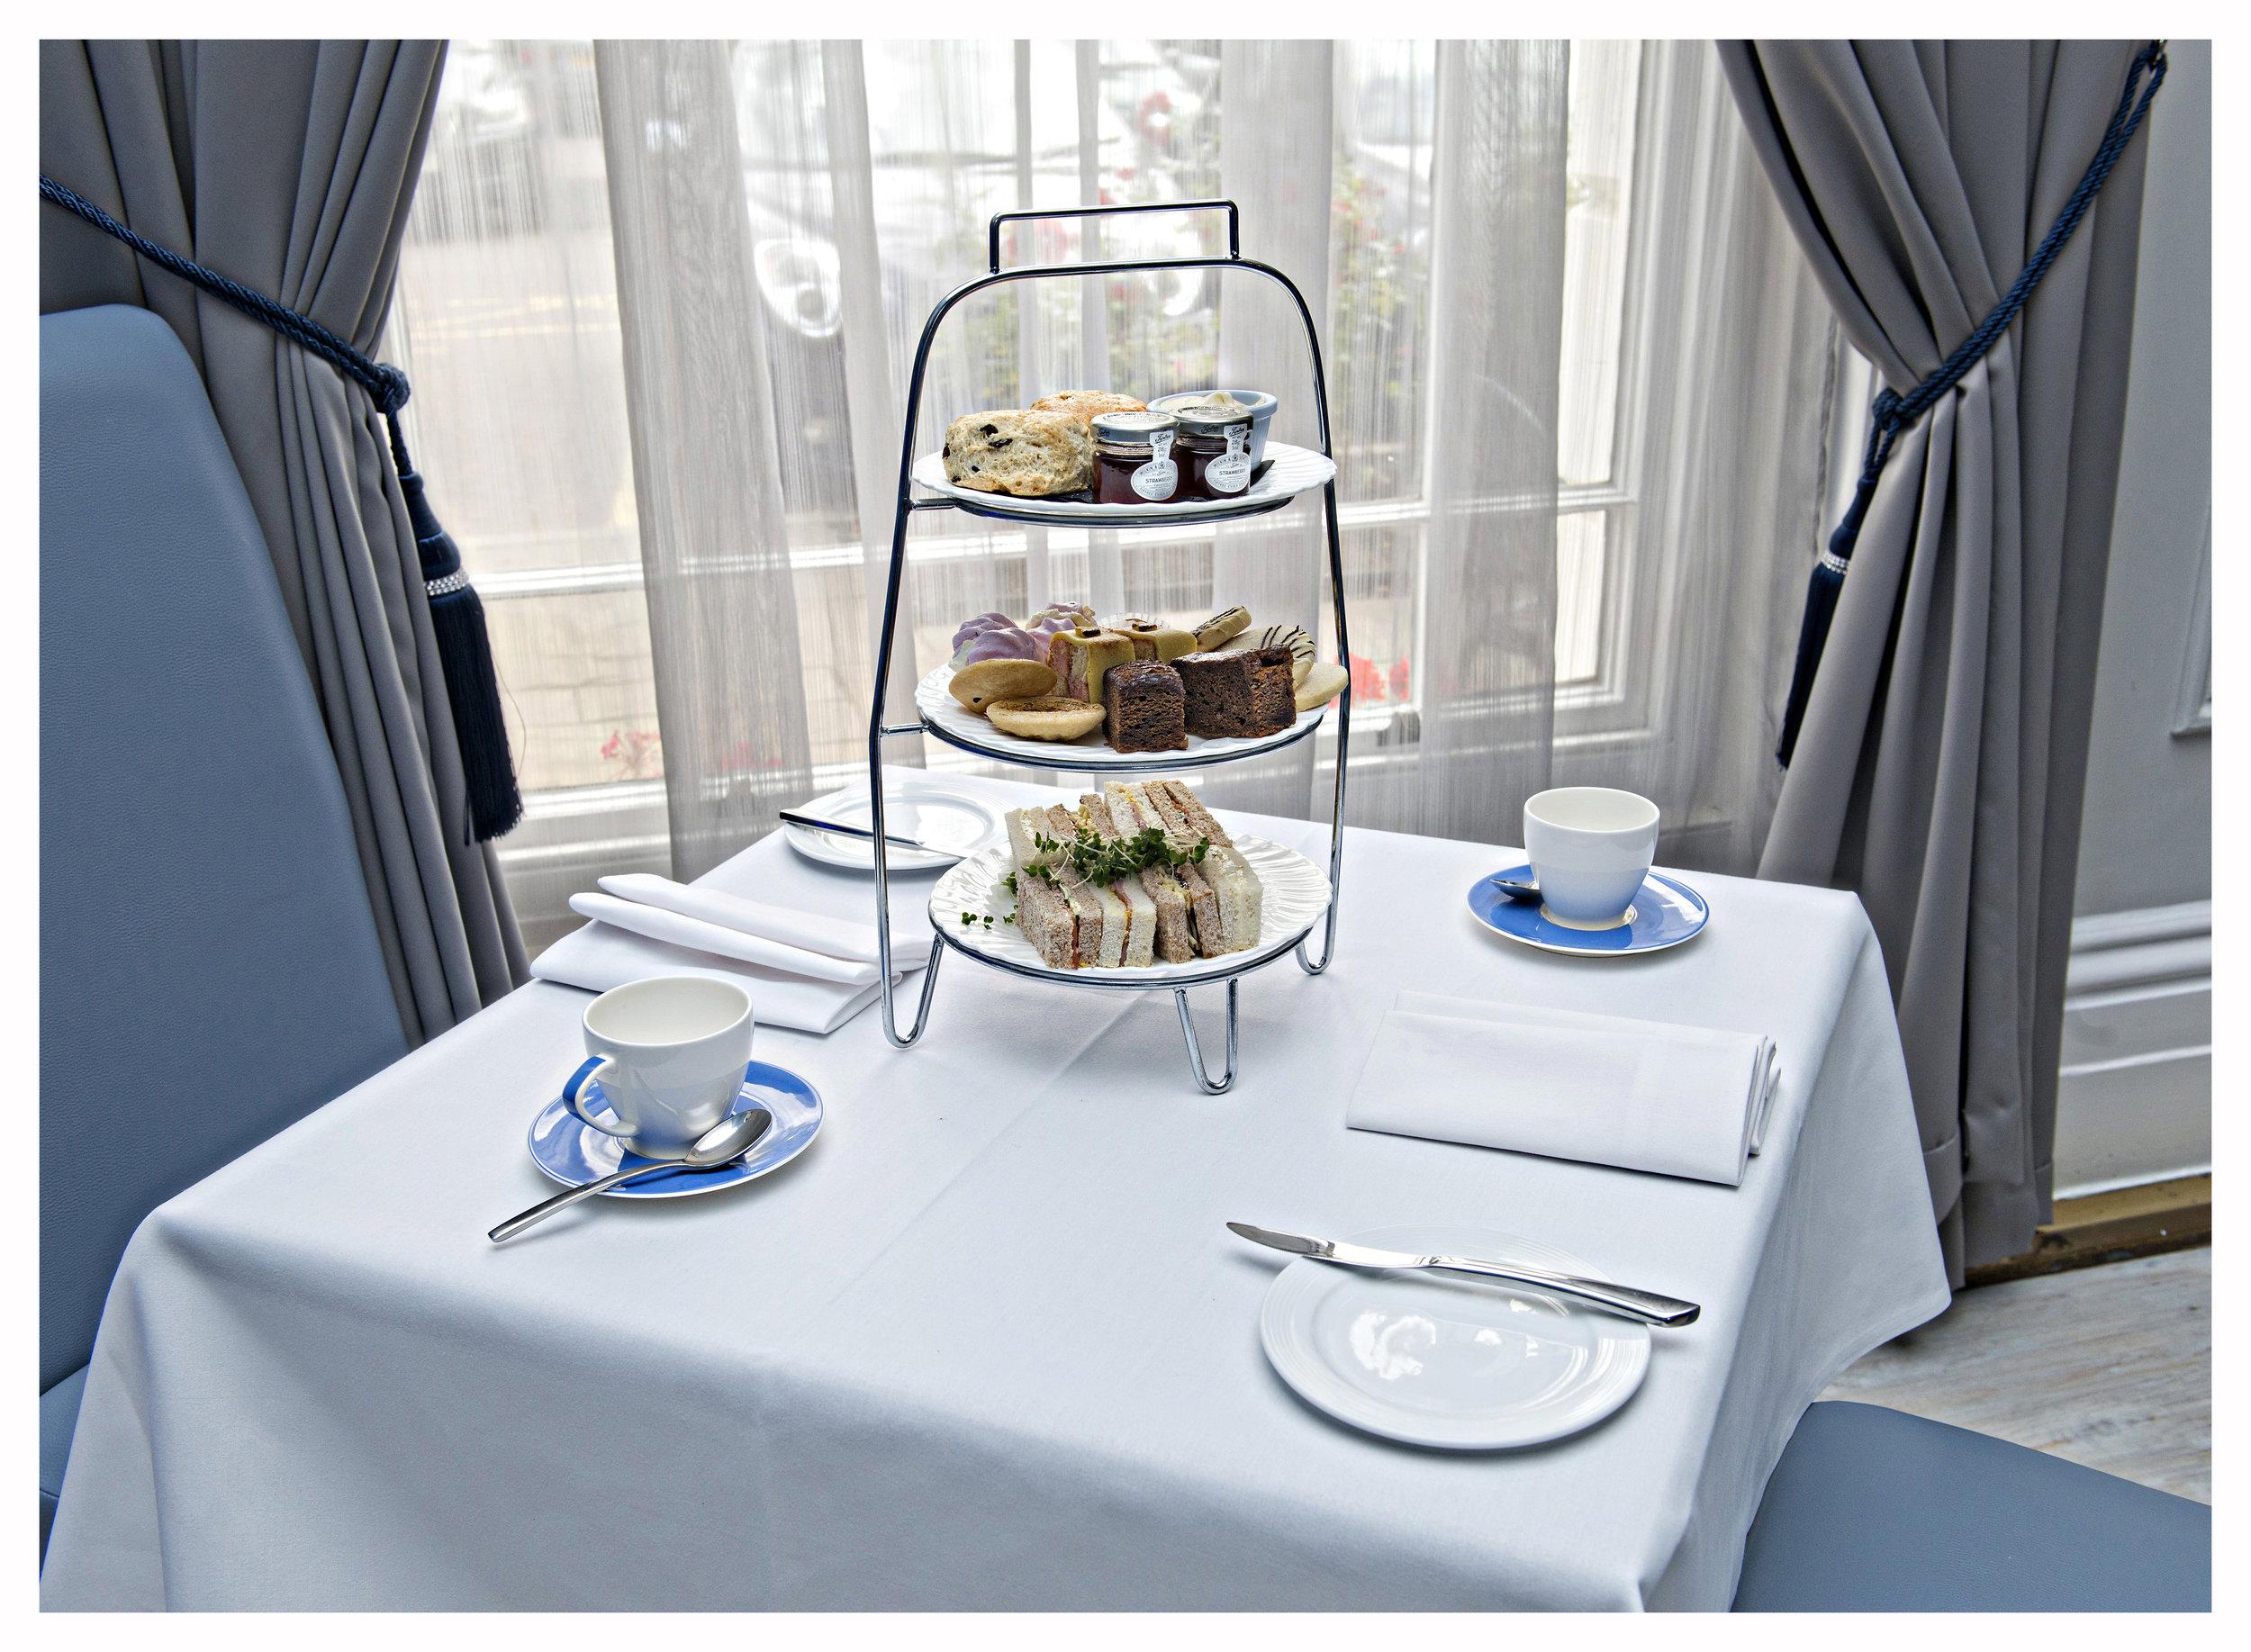 afternoon-tea-great-northern-hotel.jpg